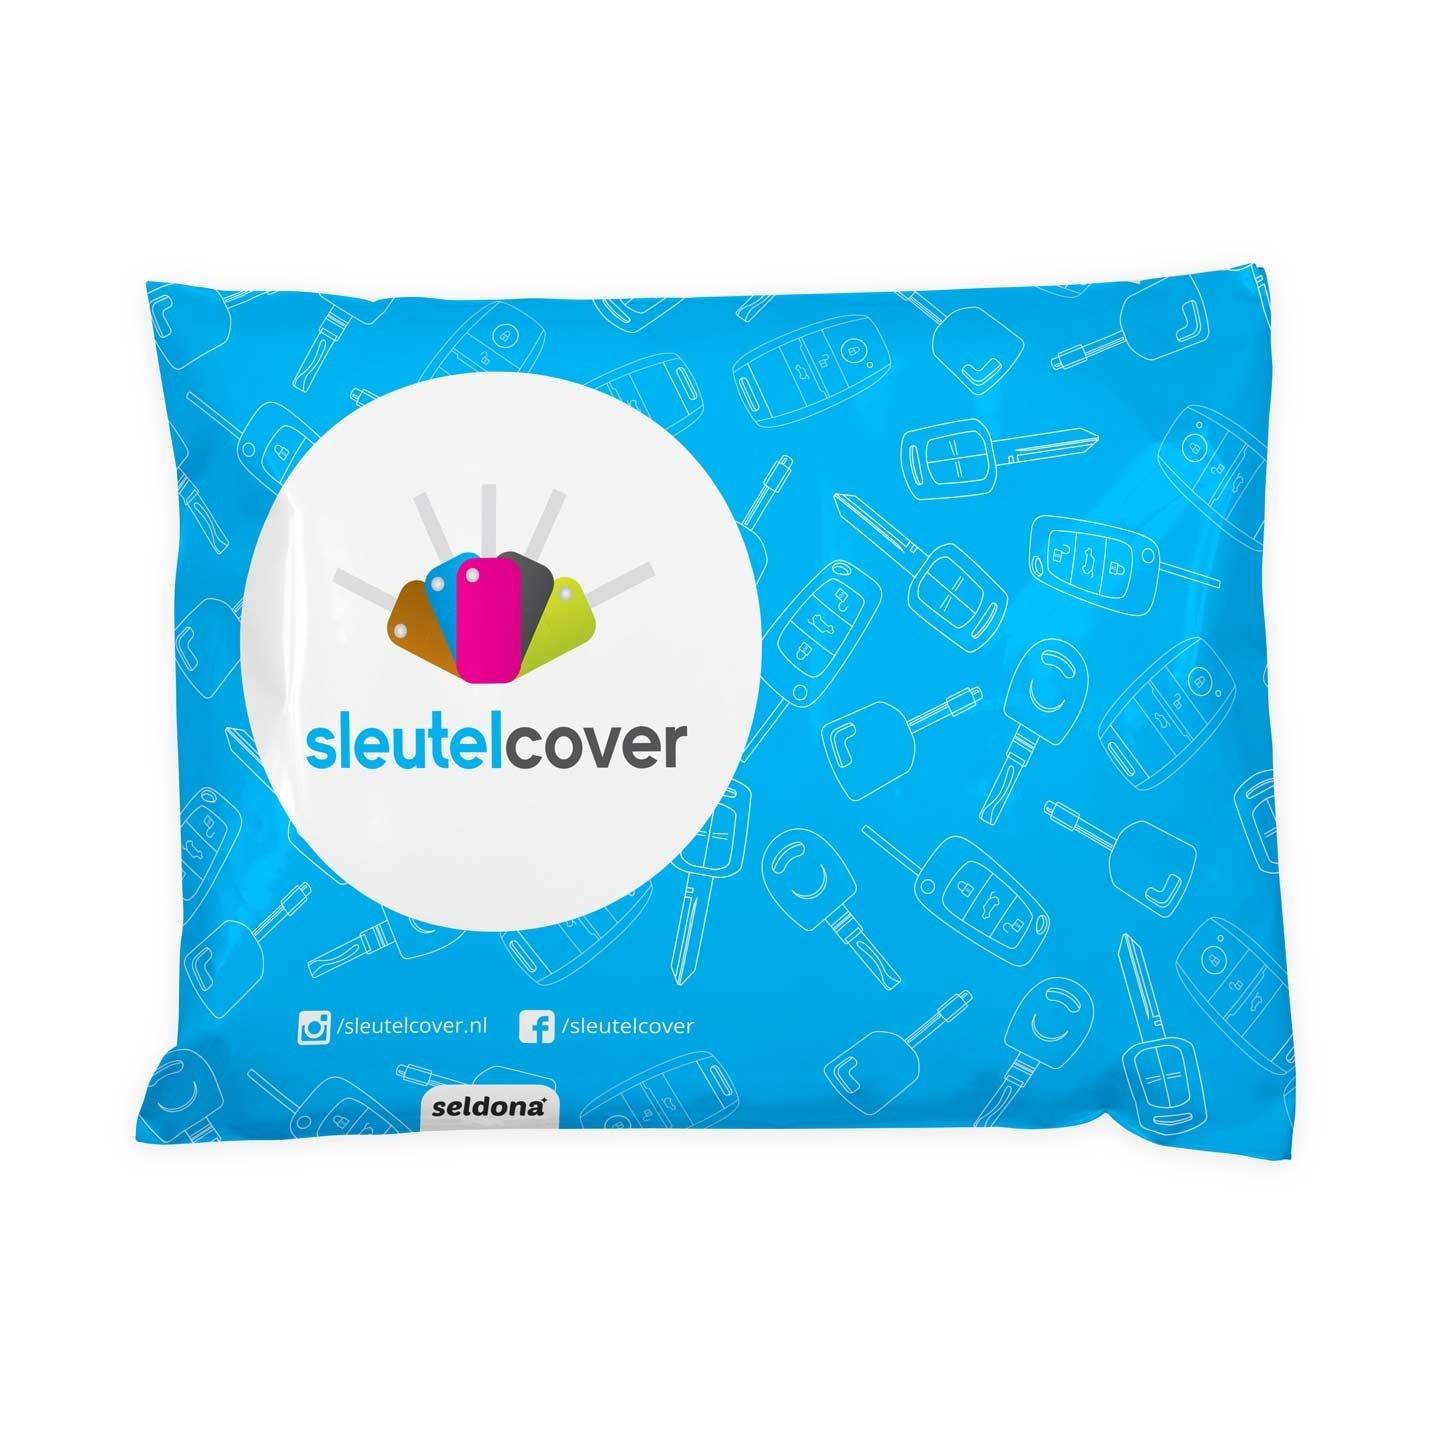 Seat SleutelCover - Lichtblauw / Silicone sleutelhoesje / beschermhoesje autosleutel